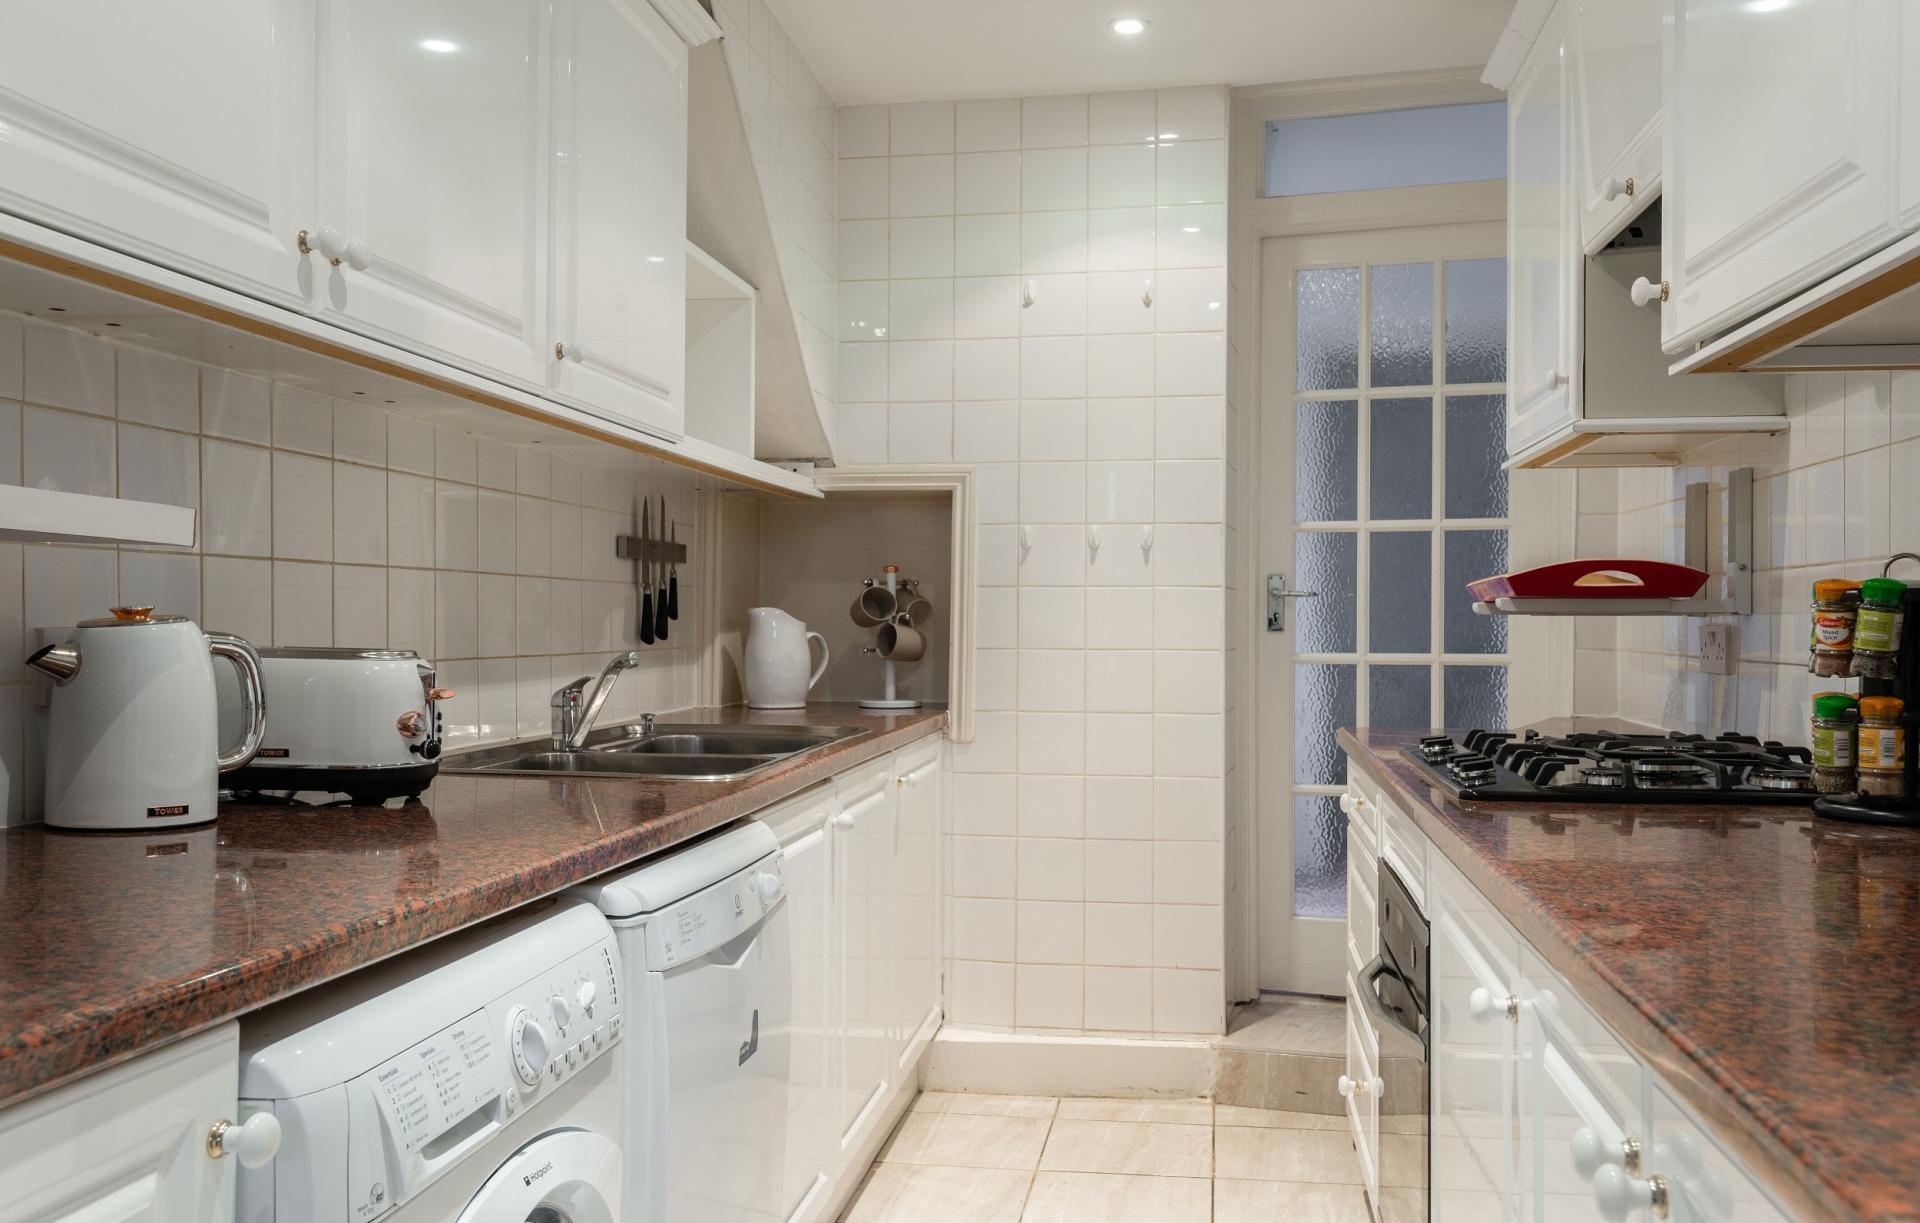 Kitchen at The Kensington Palace Mews, Kensington, London - Citybase Apartments